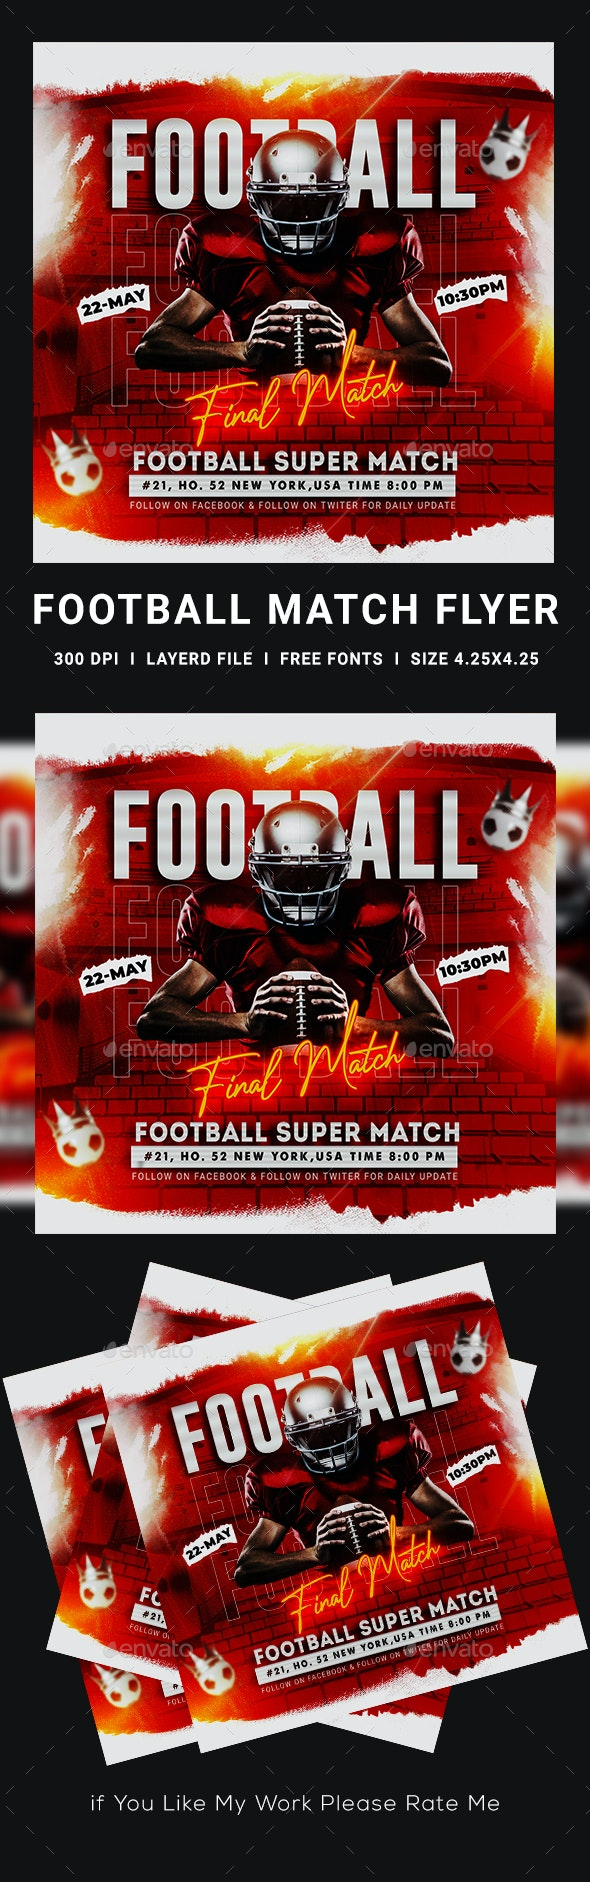 Football Match Flyer - Sports Events